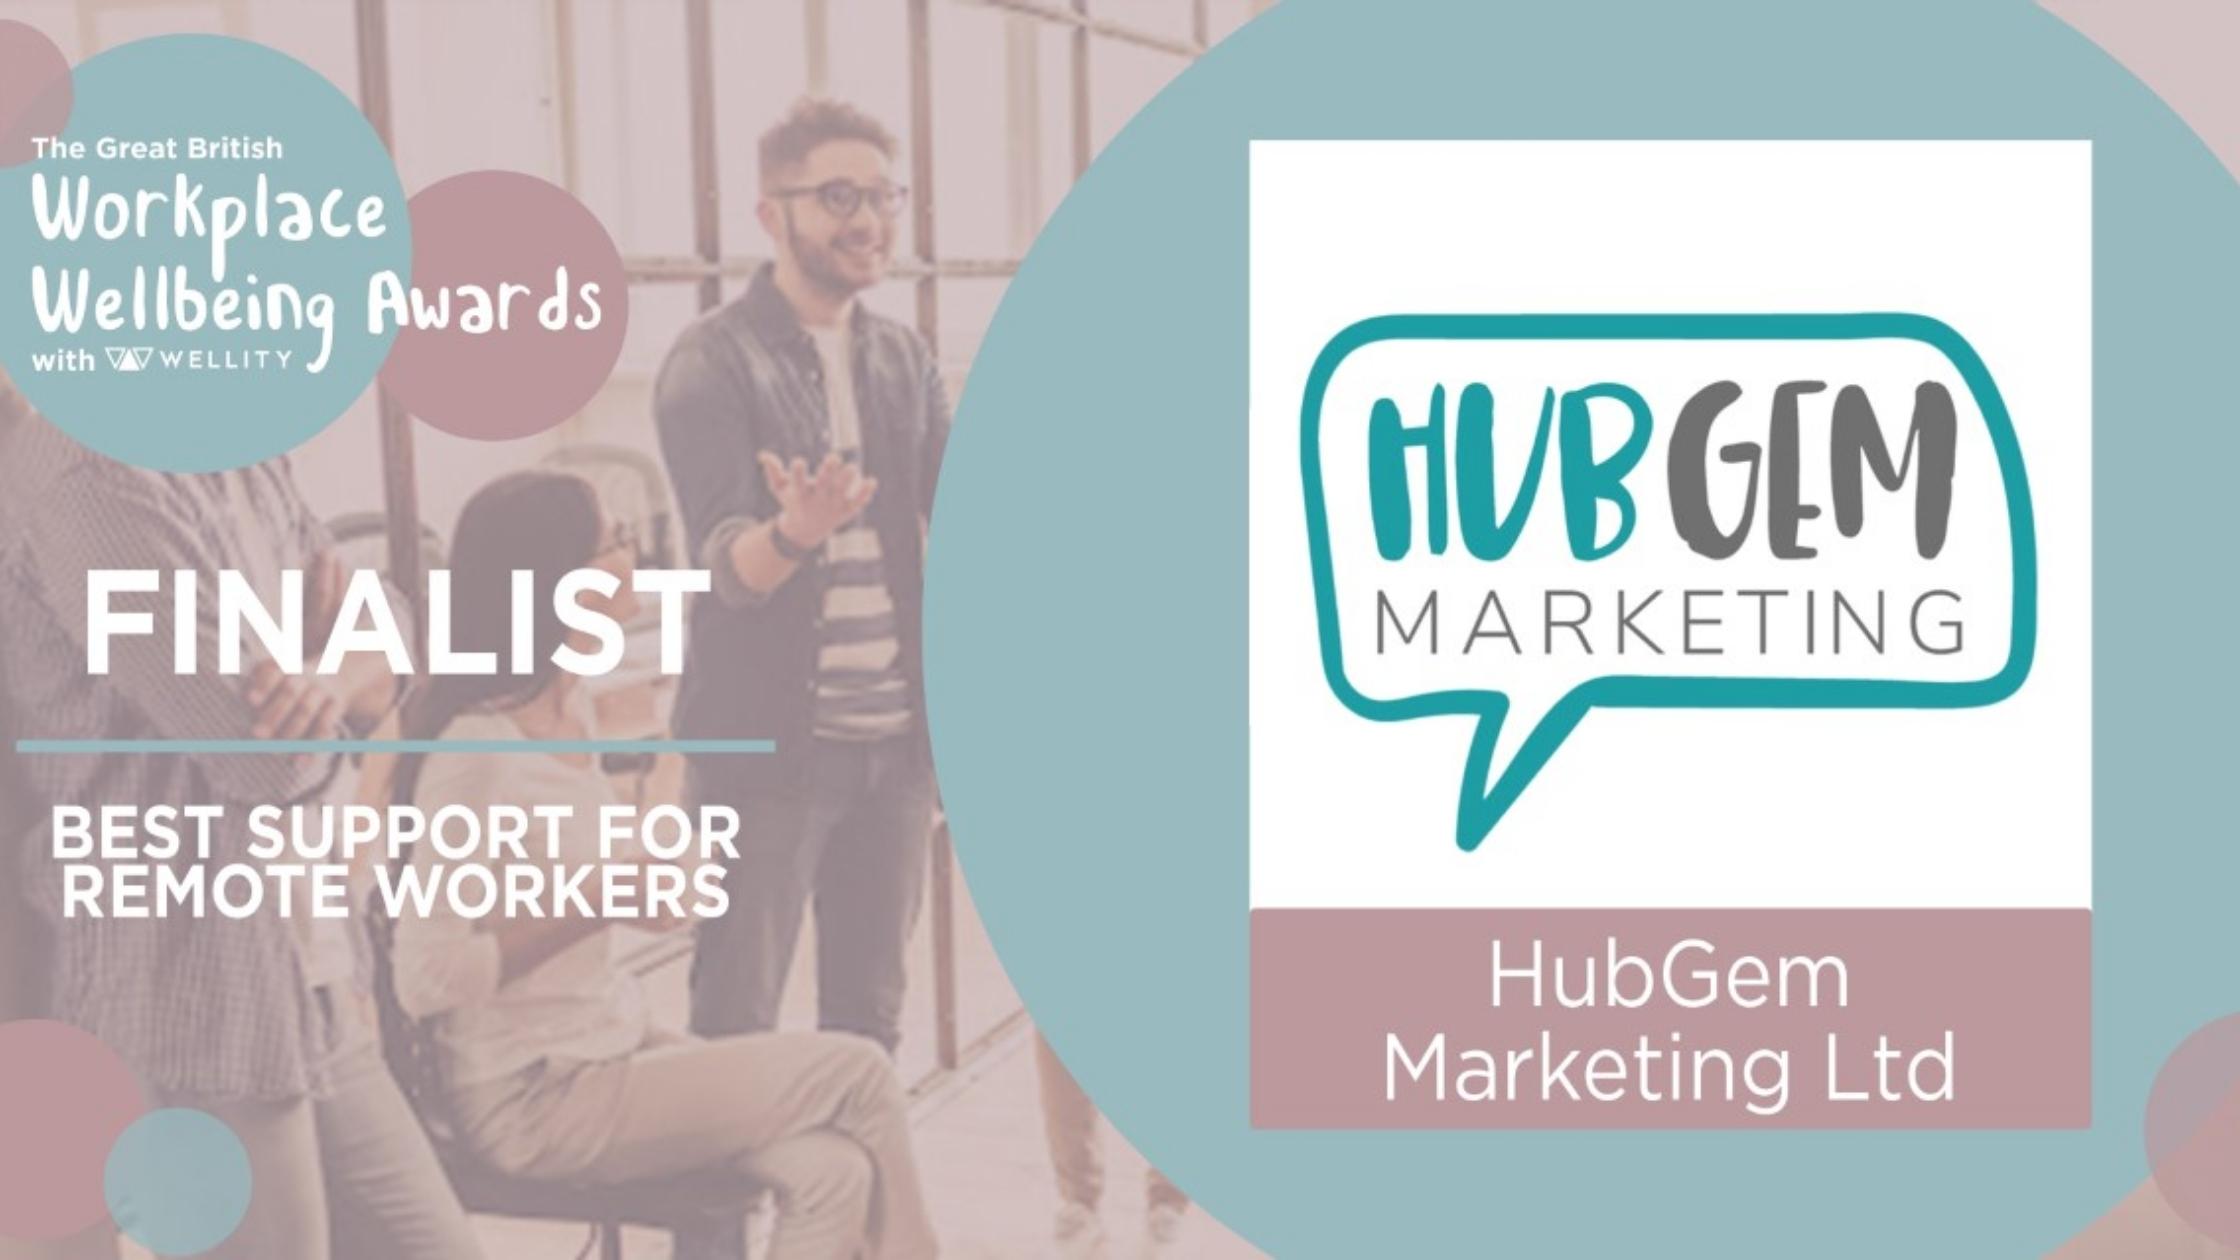 HubGem named as finalist